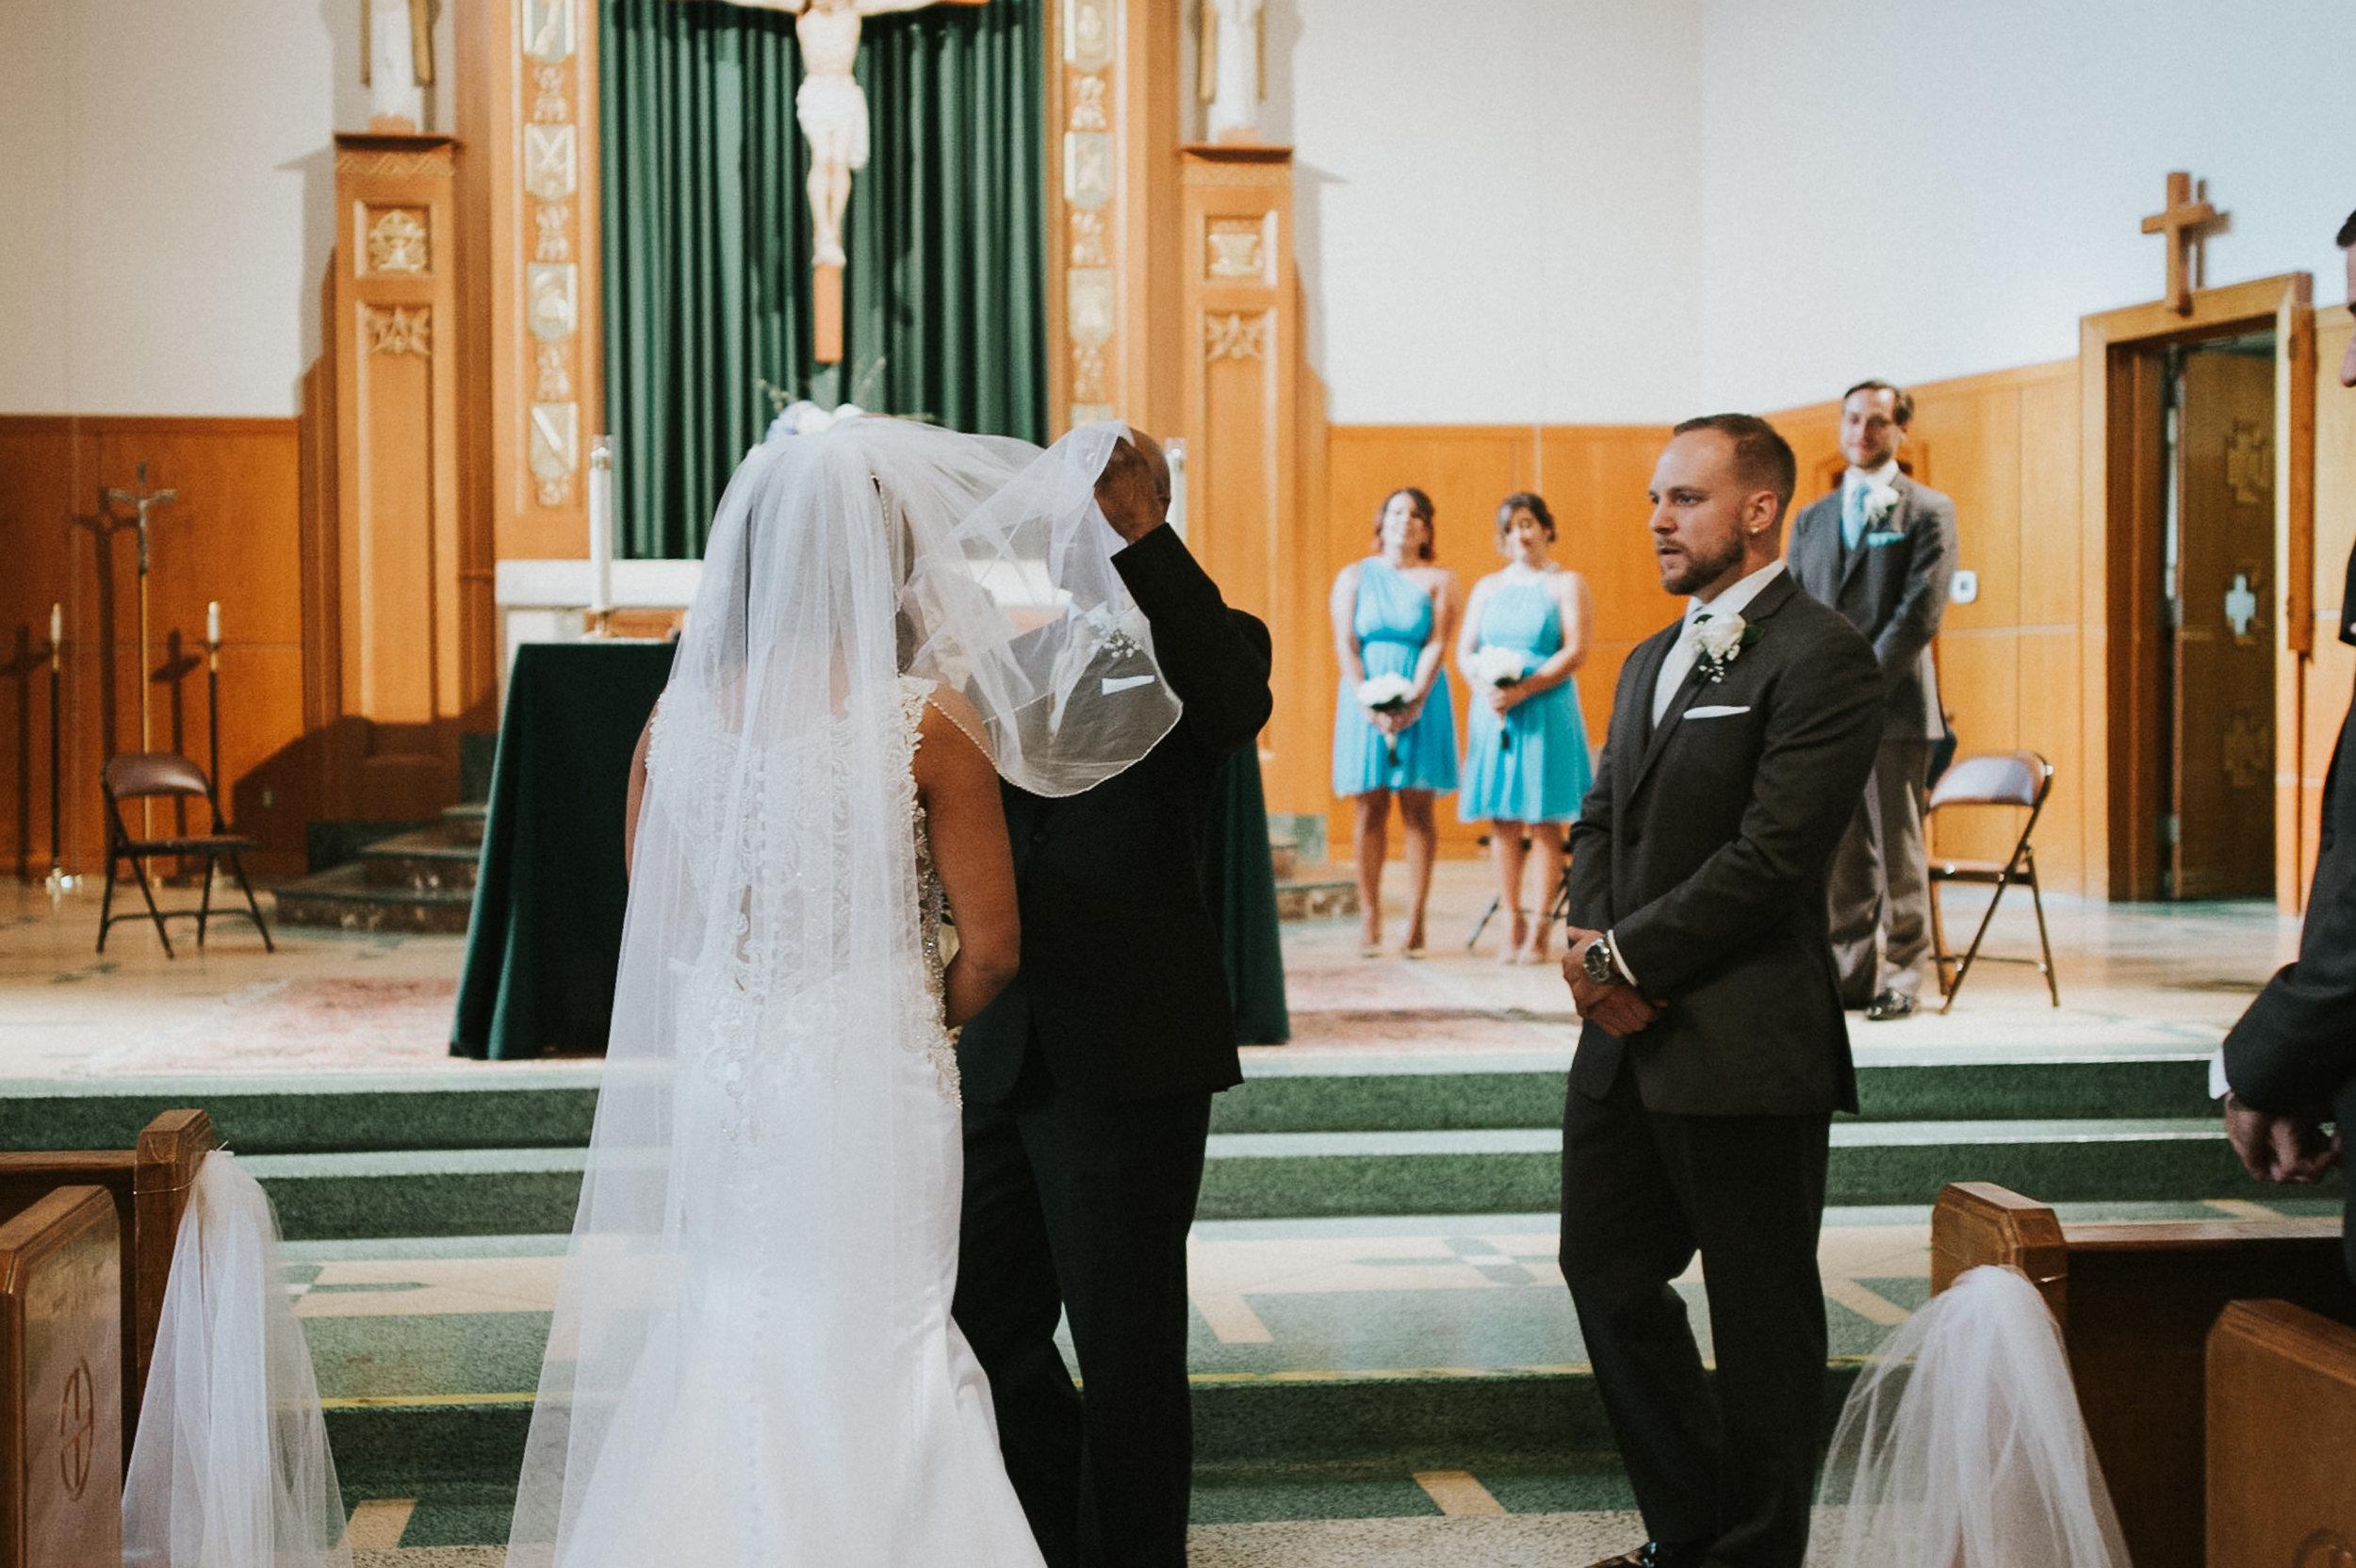 Tiana-and-Danny-Wedding-353.jpg